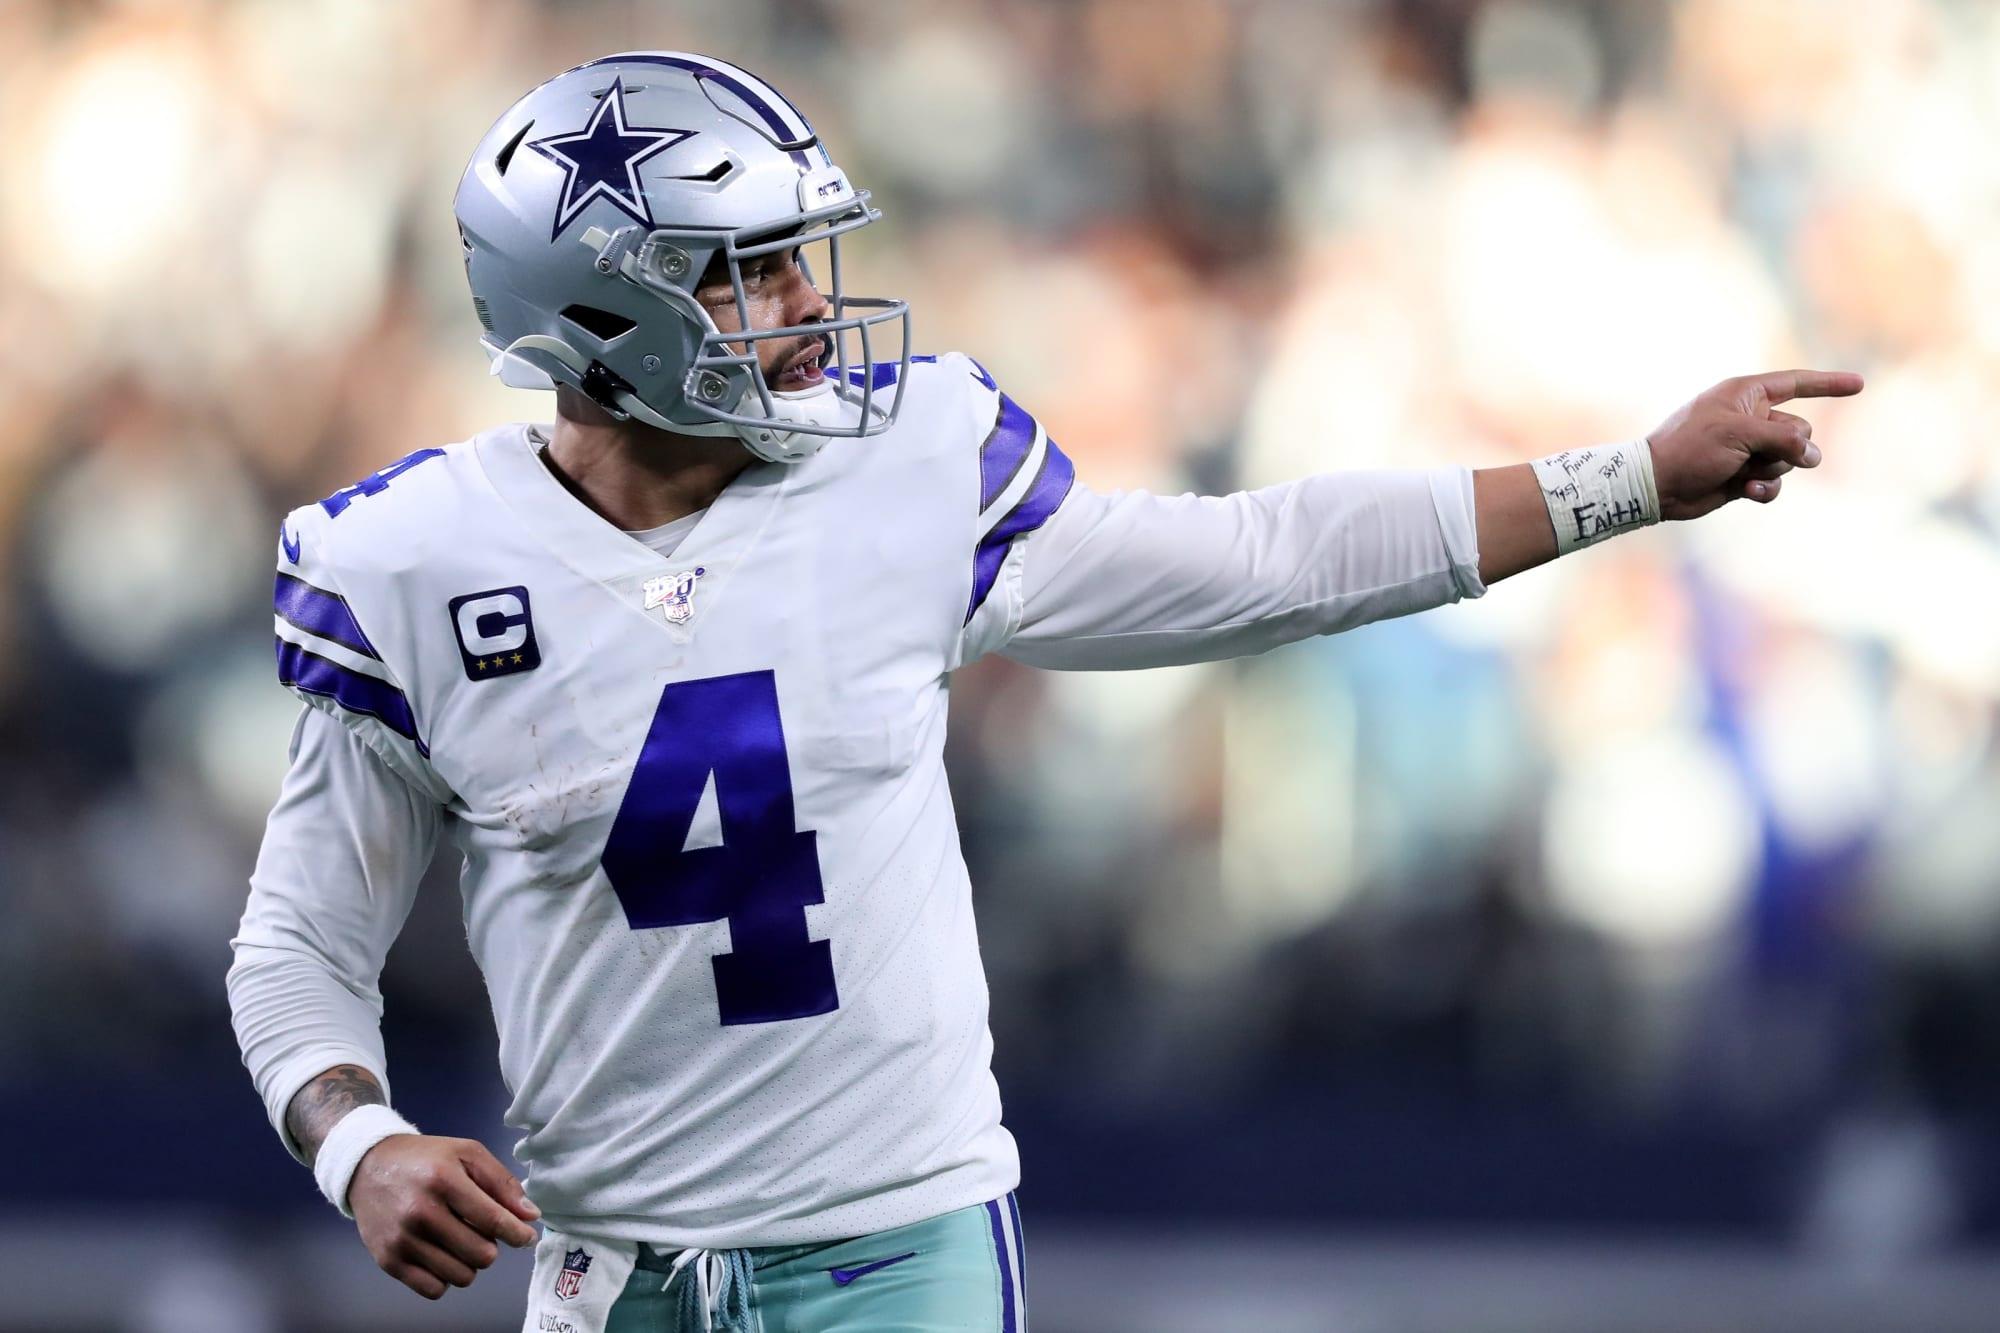 Cowboys 2021 schedule release offers a few surprises